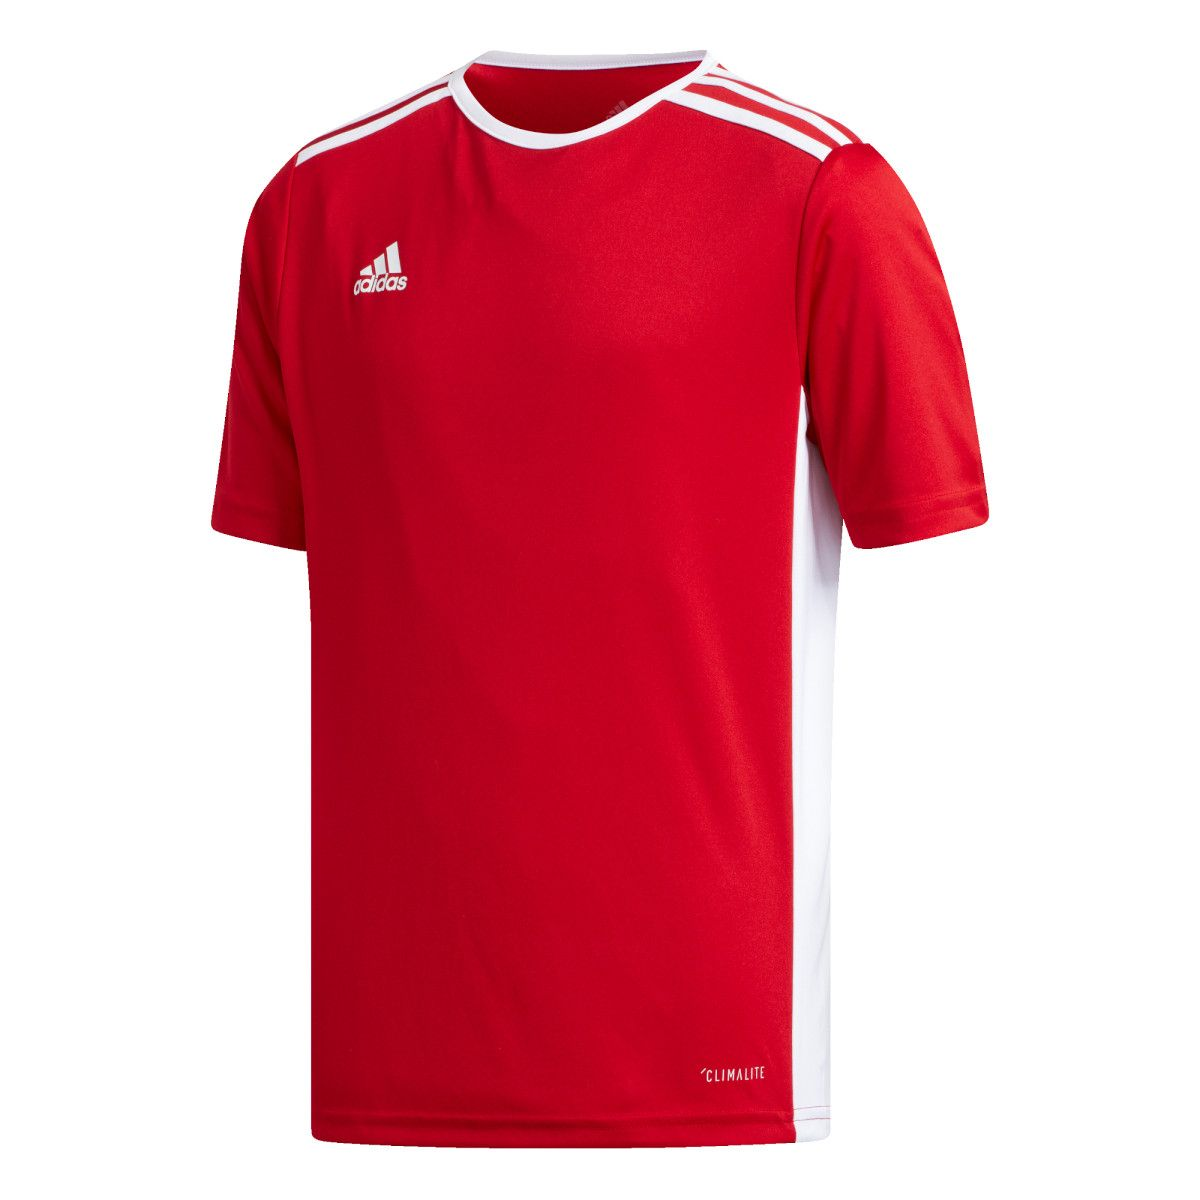 adidas Entrada 18 Boy's Jersey T-Shirt